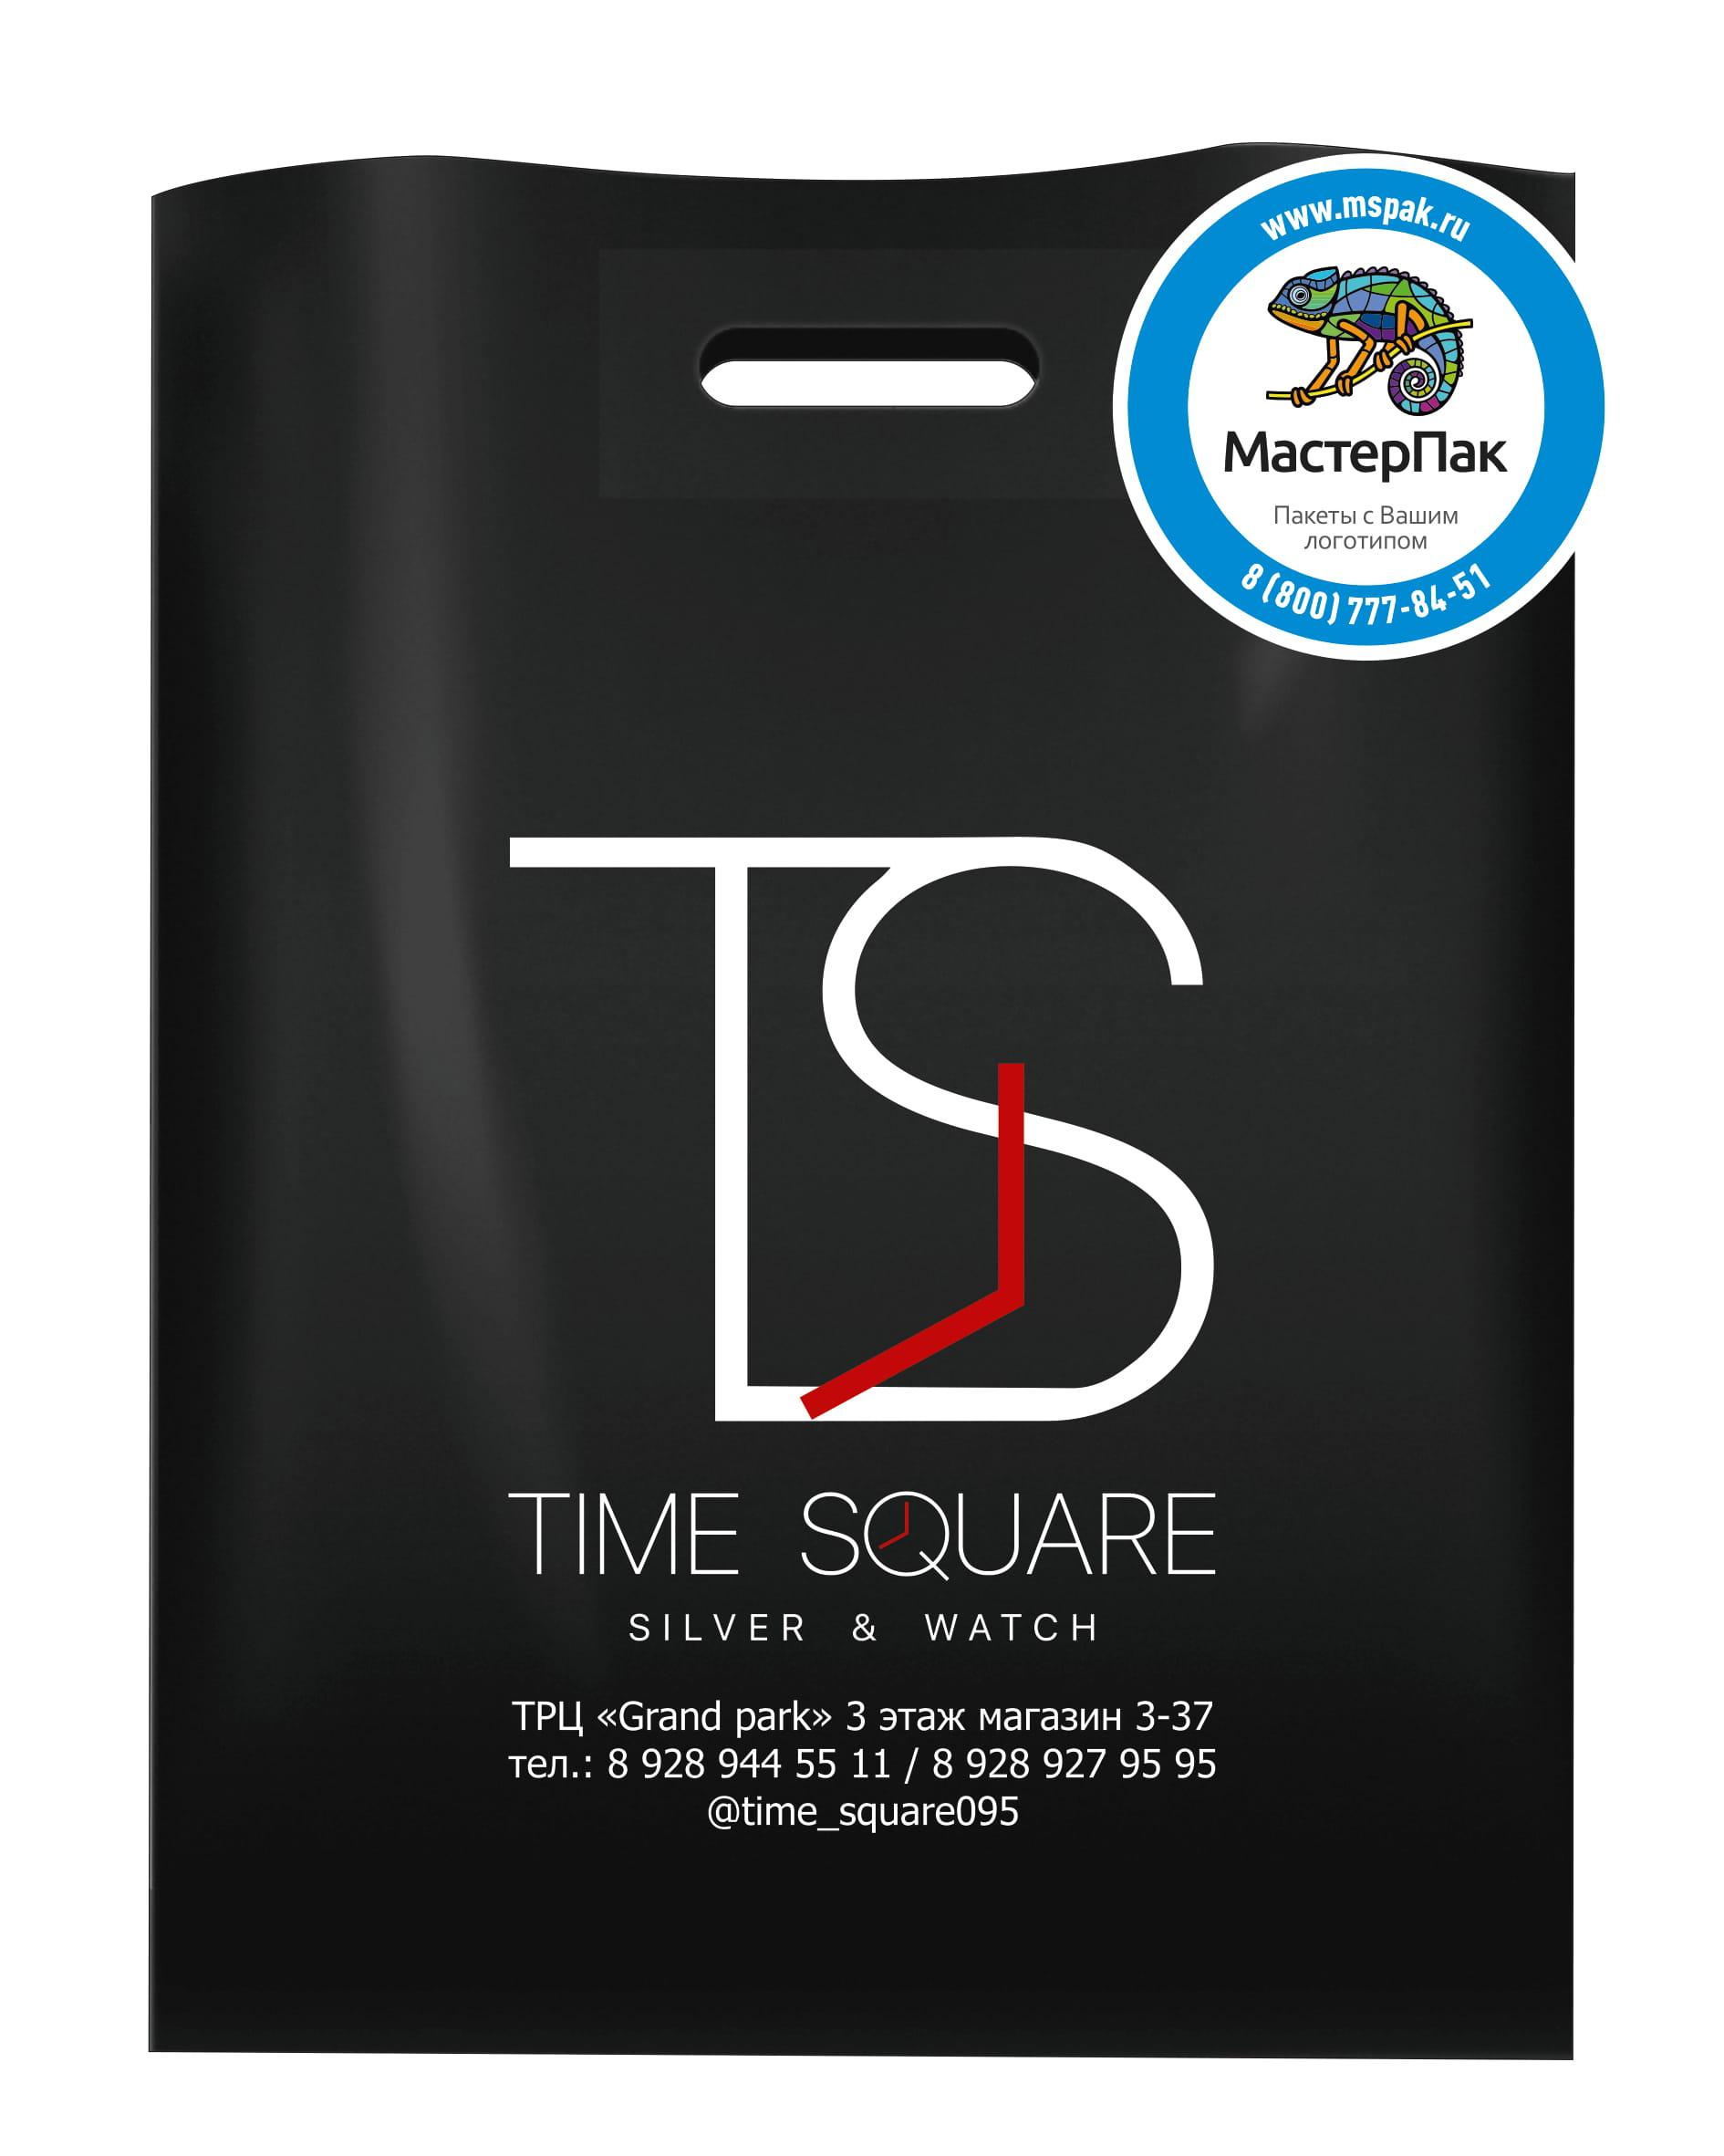 Пакет ПВД с логотипом Time square, Москва, 70 мкм, 30*40, черный